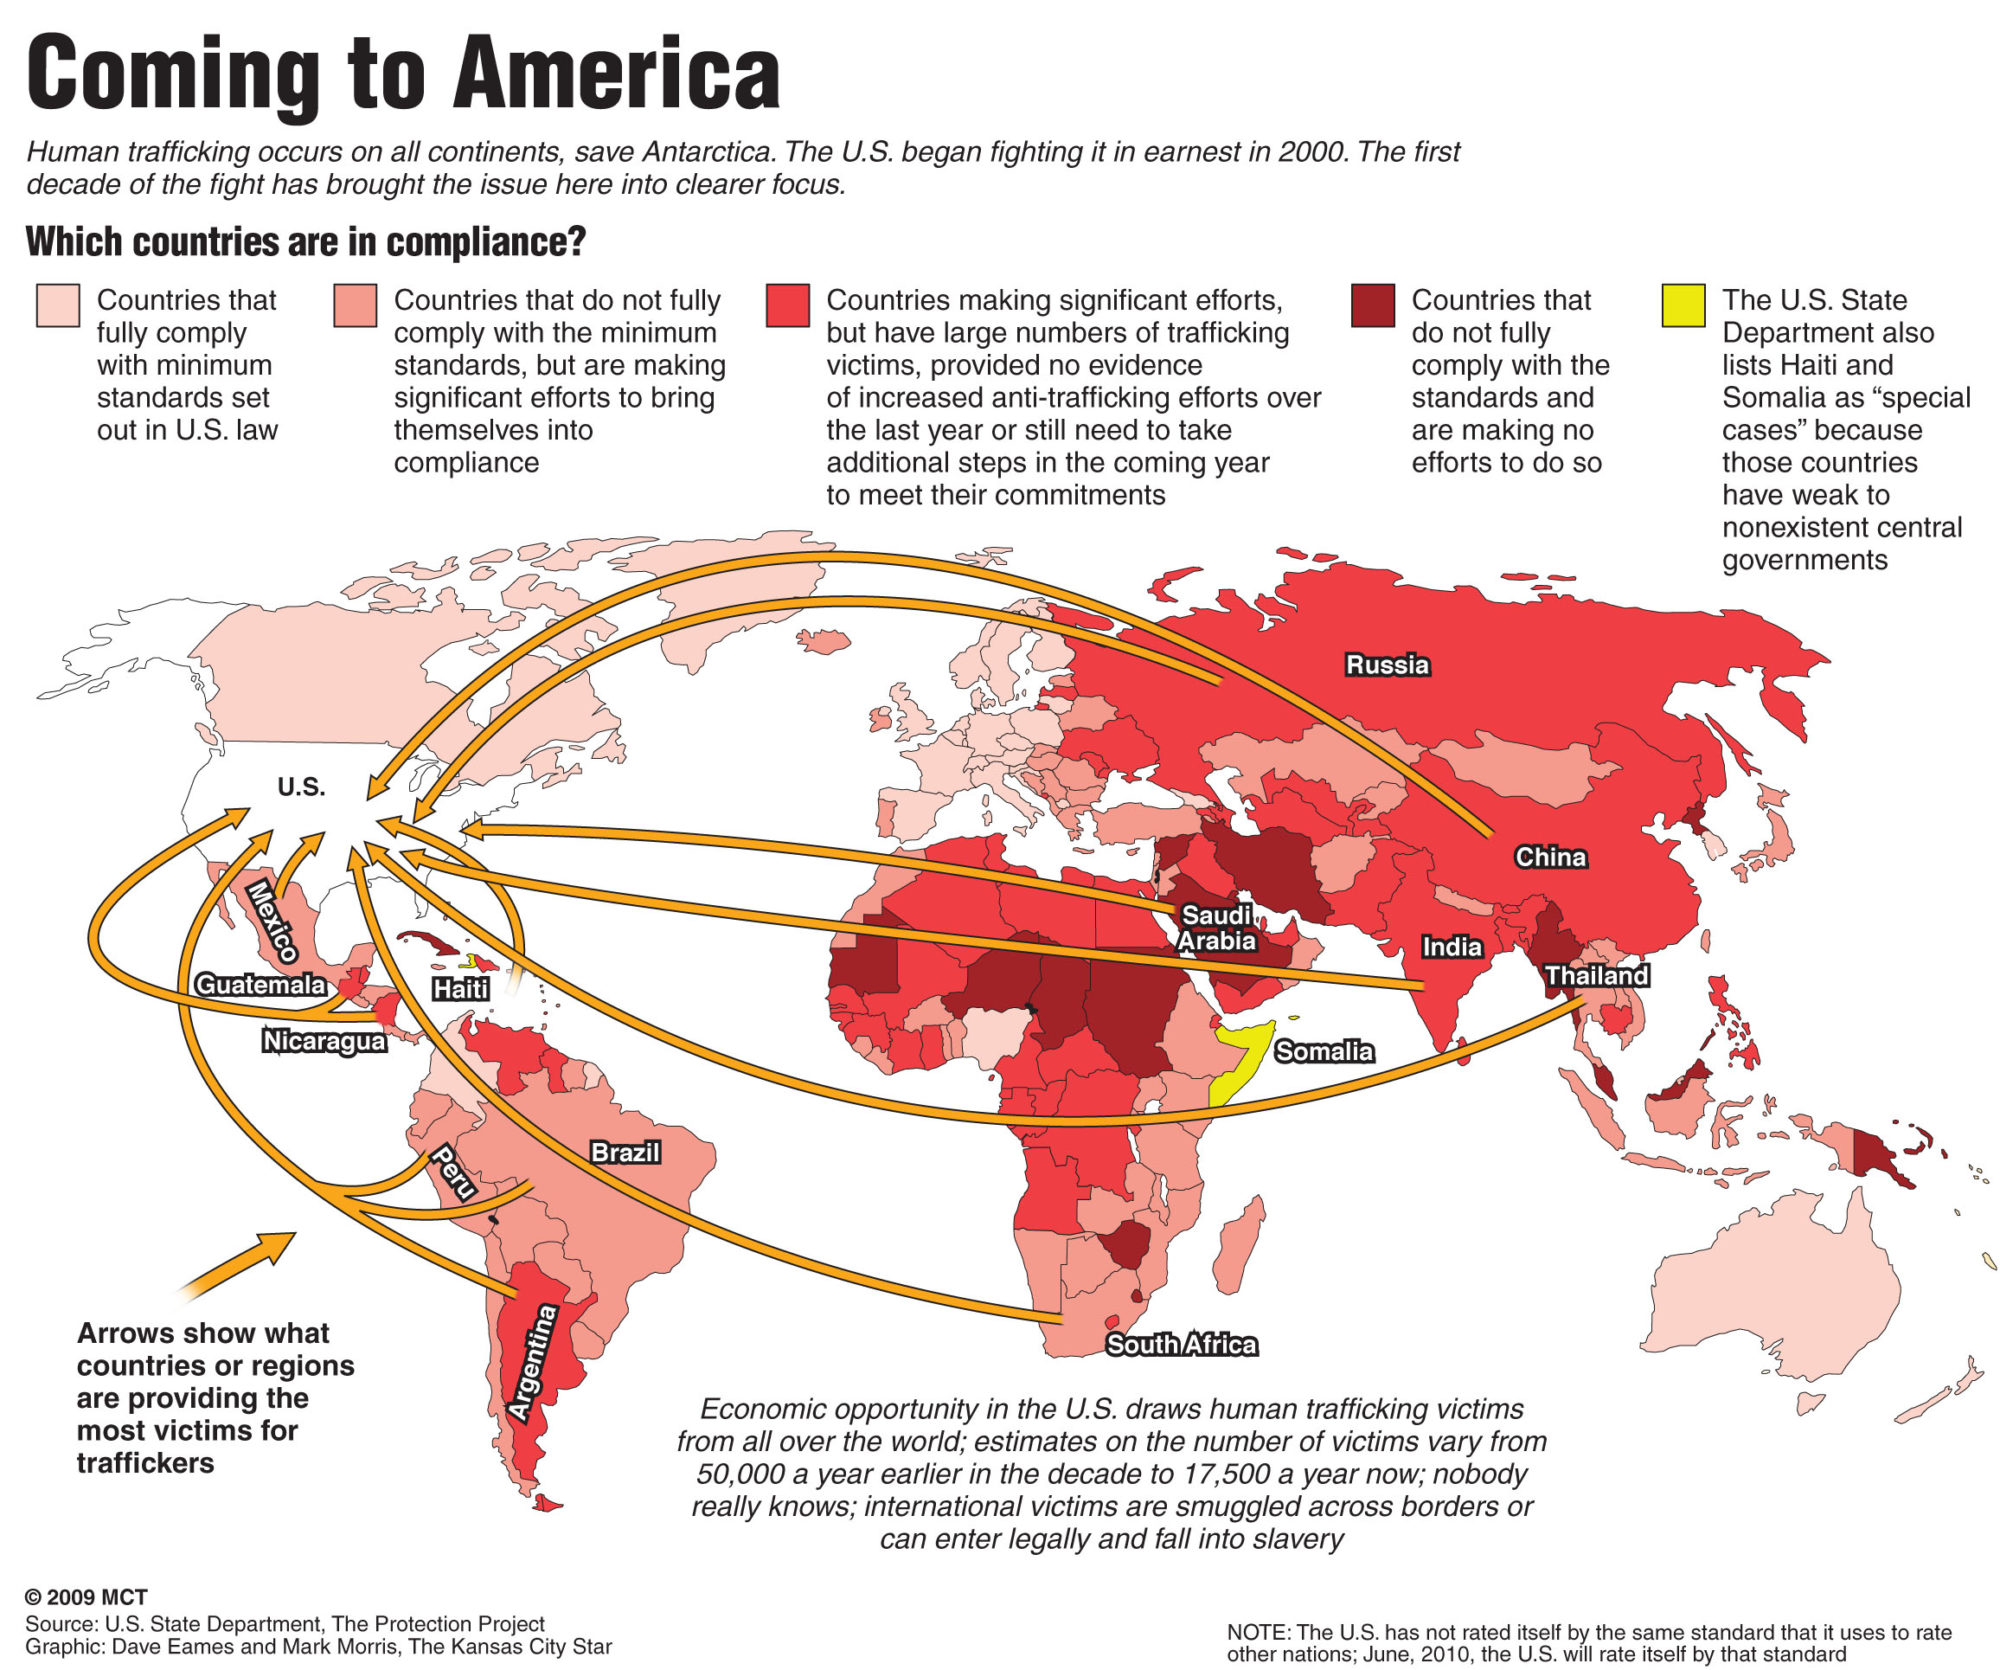 Maps and Statistics - Human Trafficking